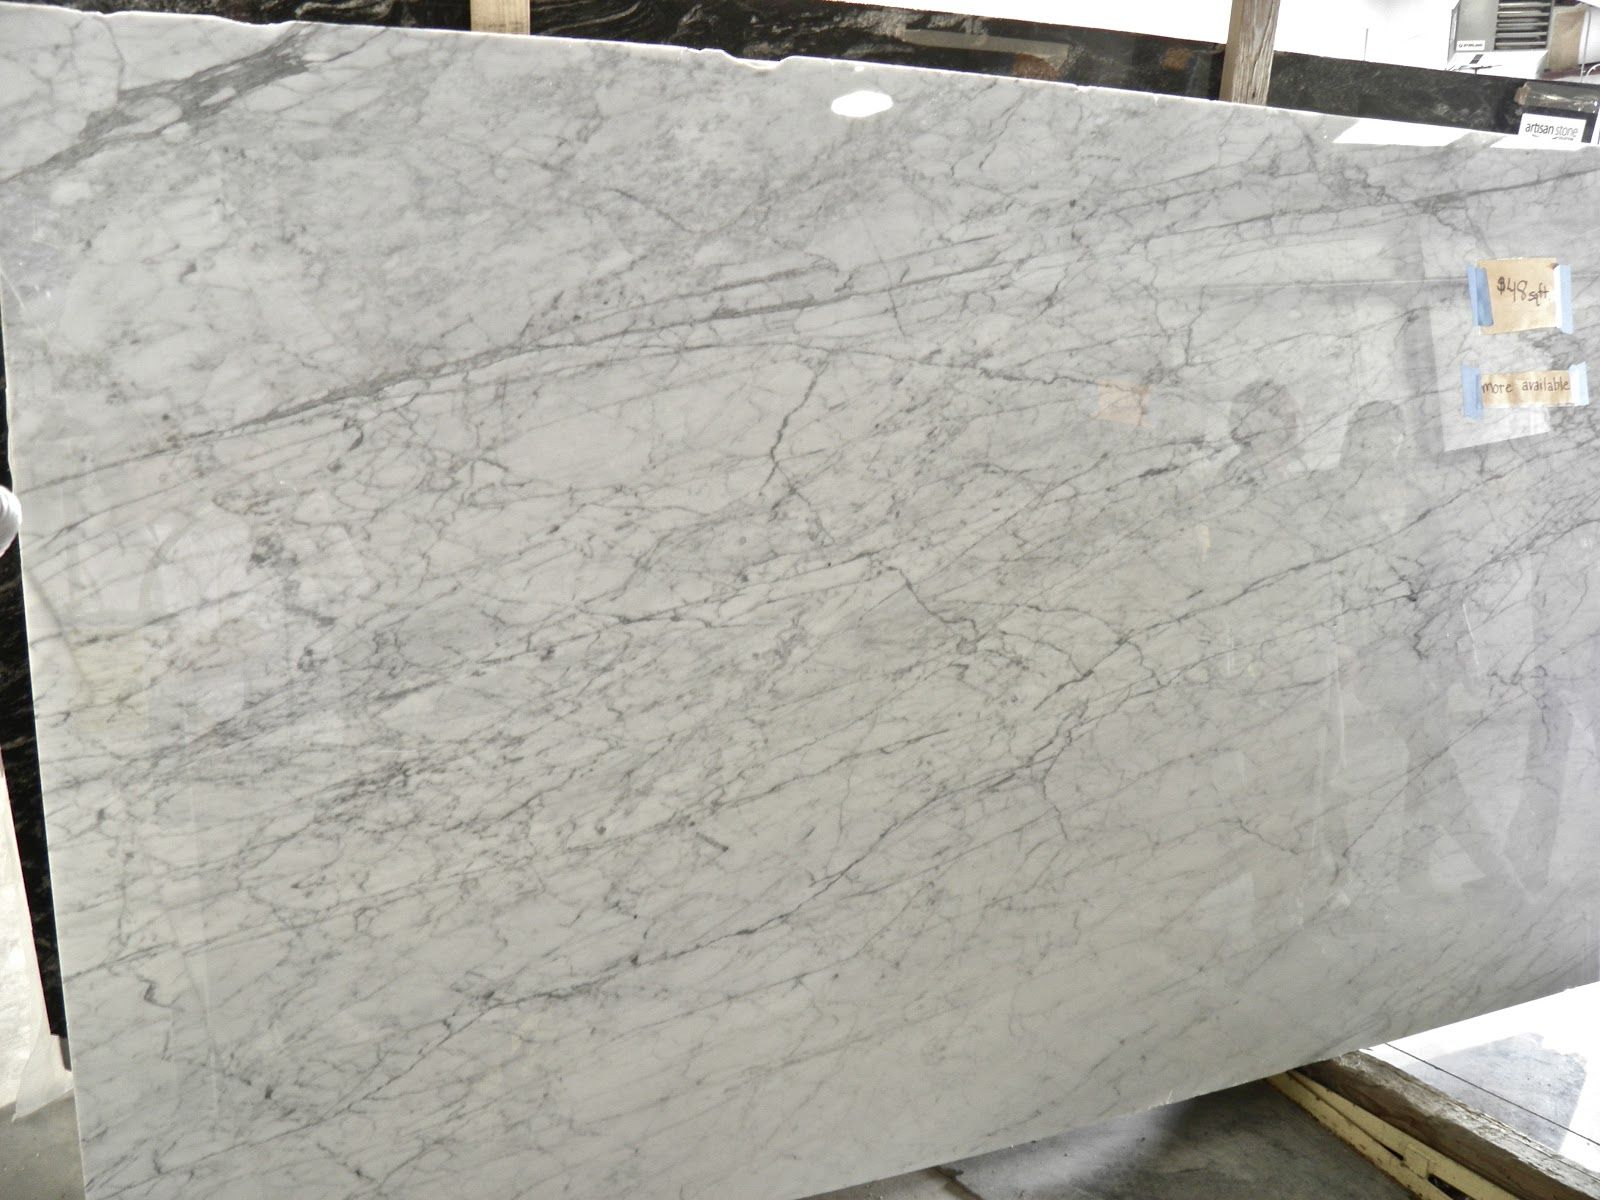 Granite That Looks Like Carrara Marble Carrara Marble Perfection